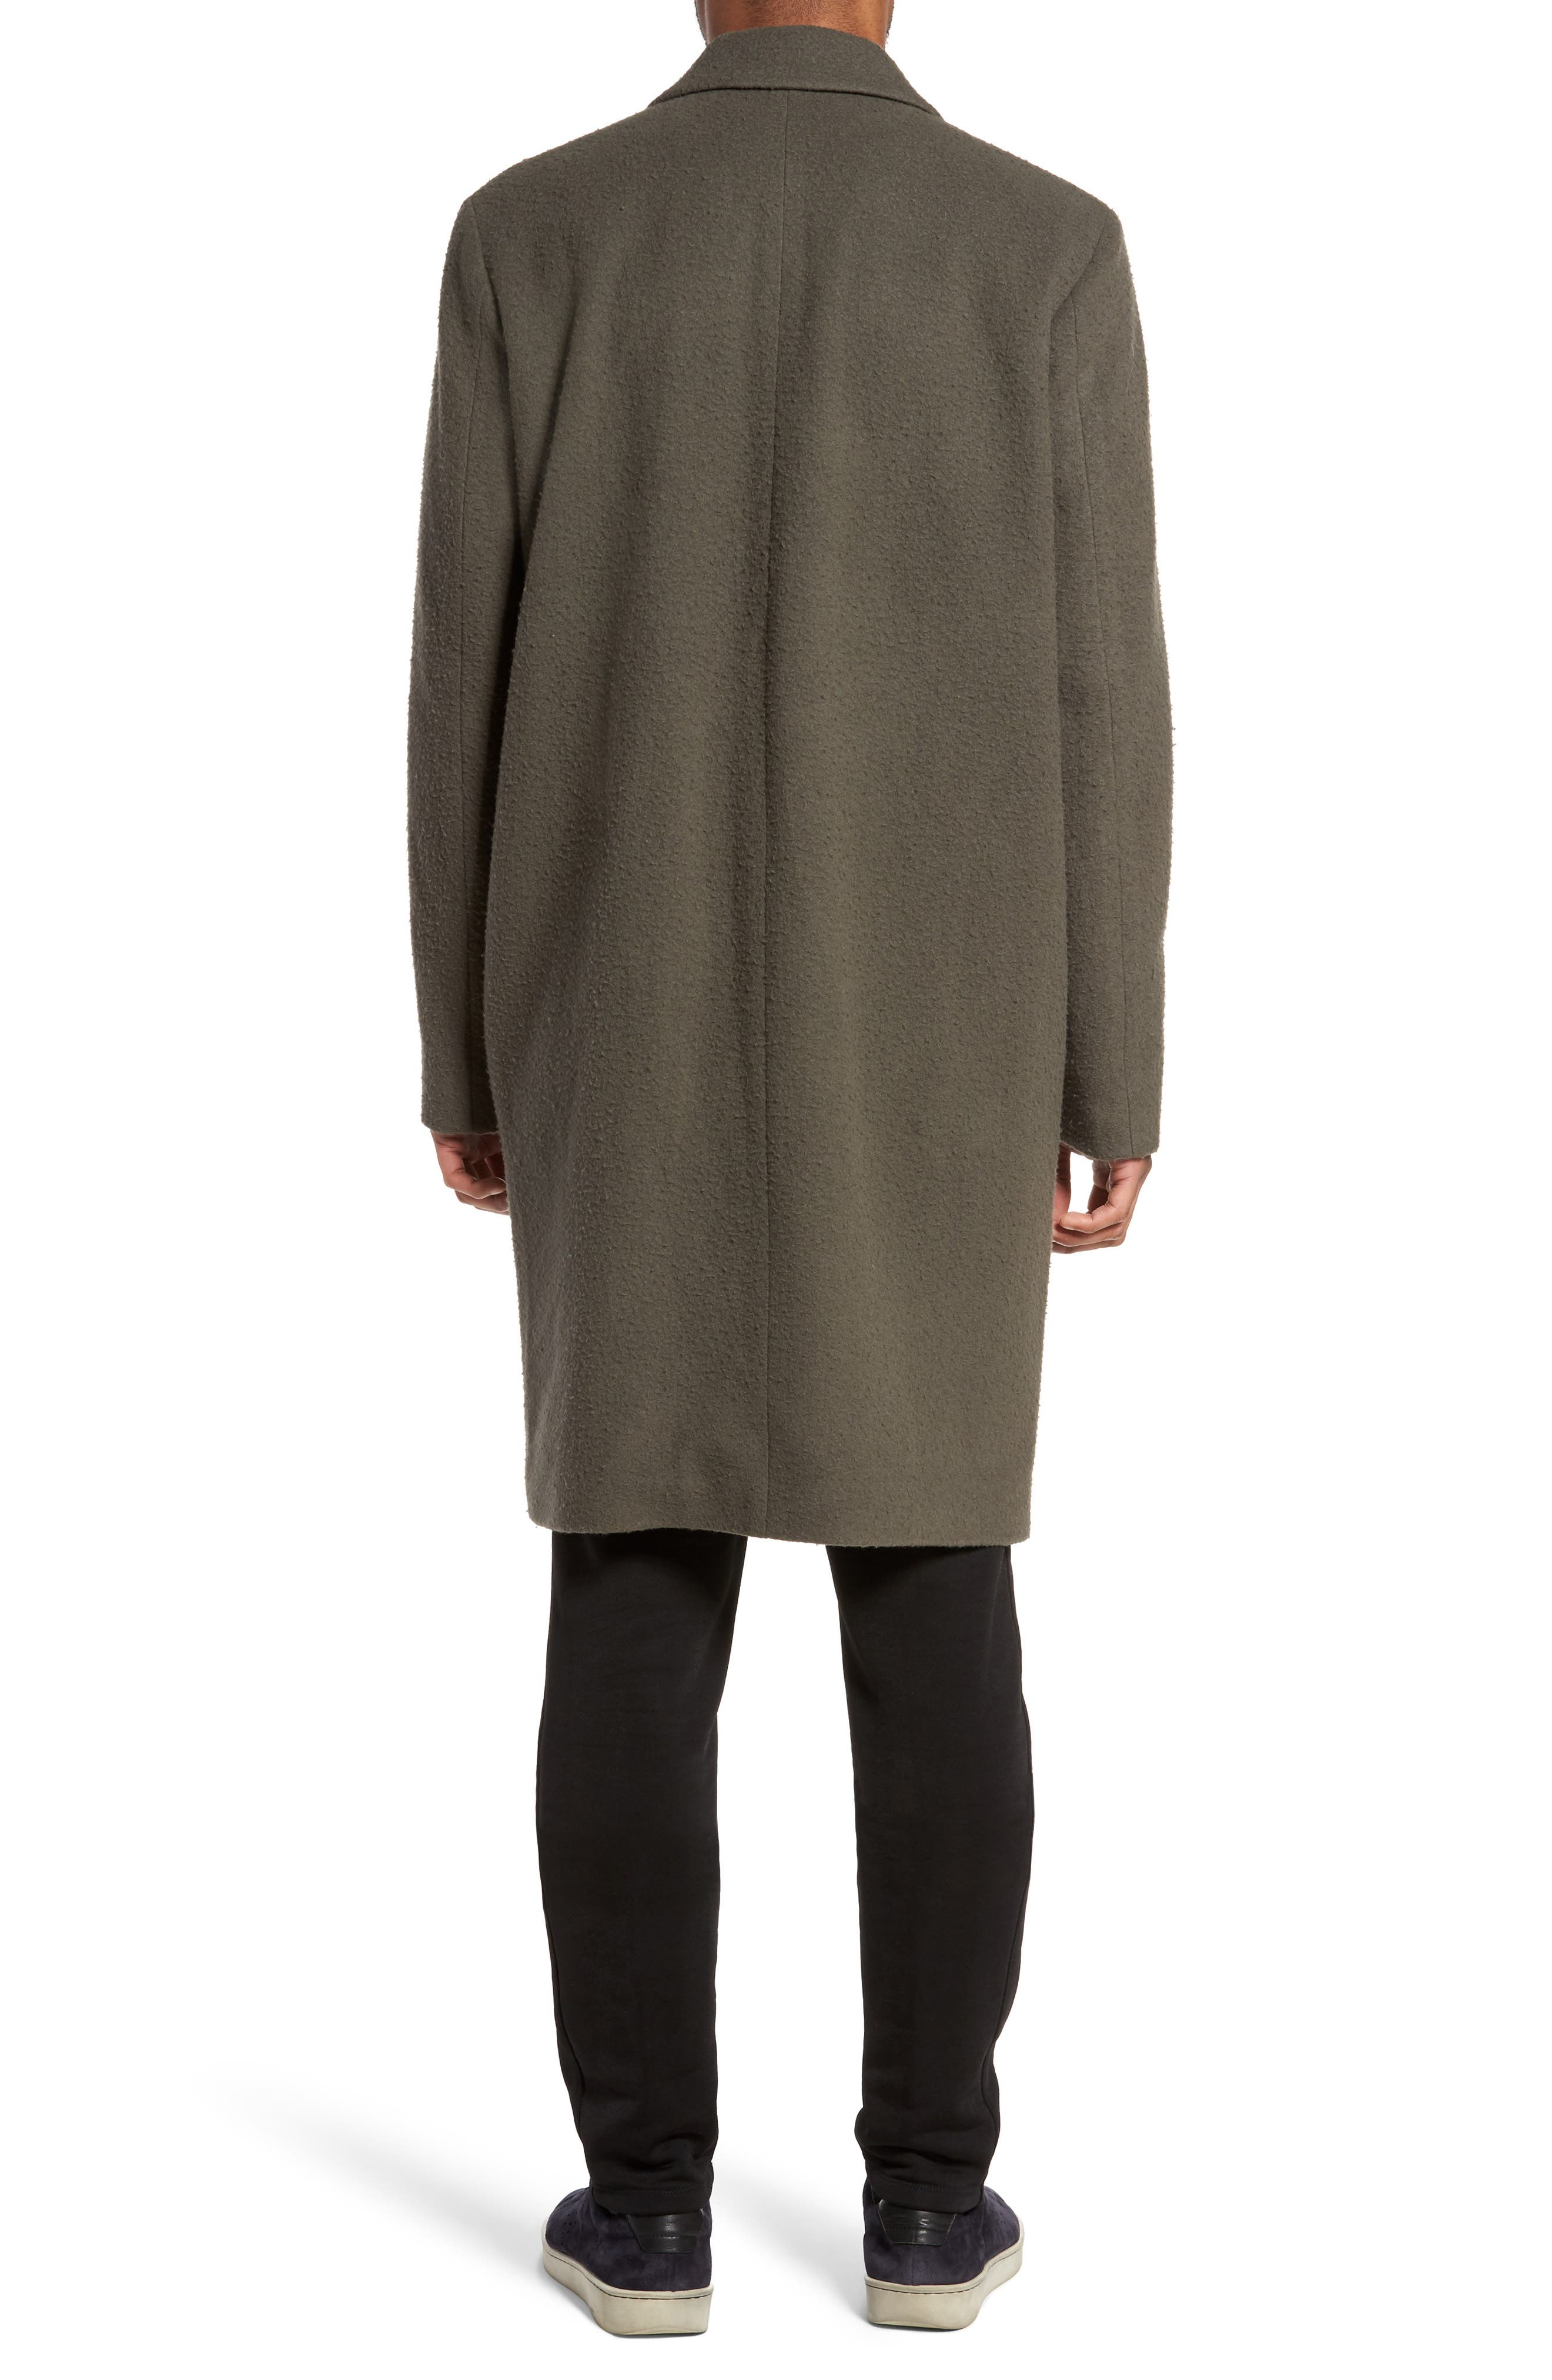 Distressed Wool Blend Car Coat,                             Alternate thumbnail 2, color,                             Olive